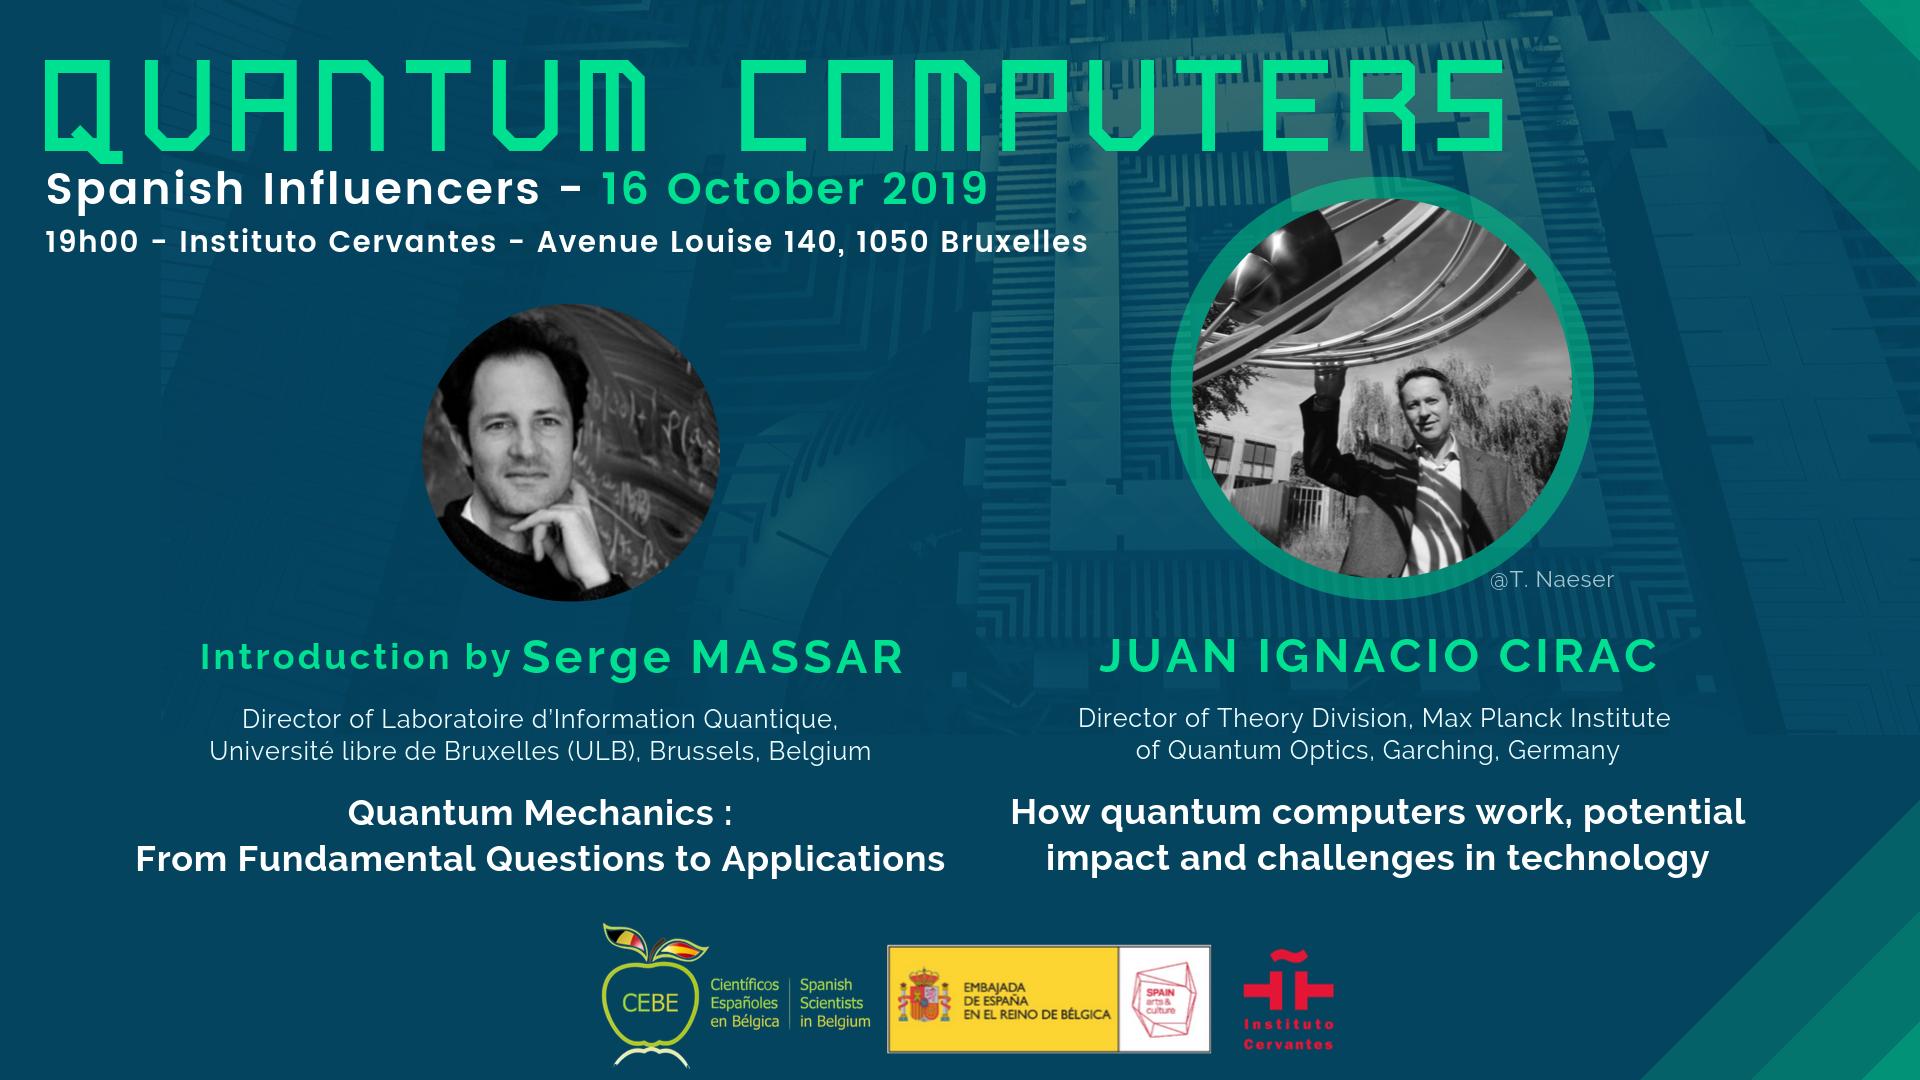 Quantum Computers, by Ignacio Cirac